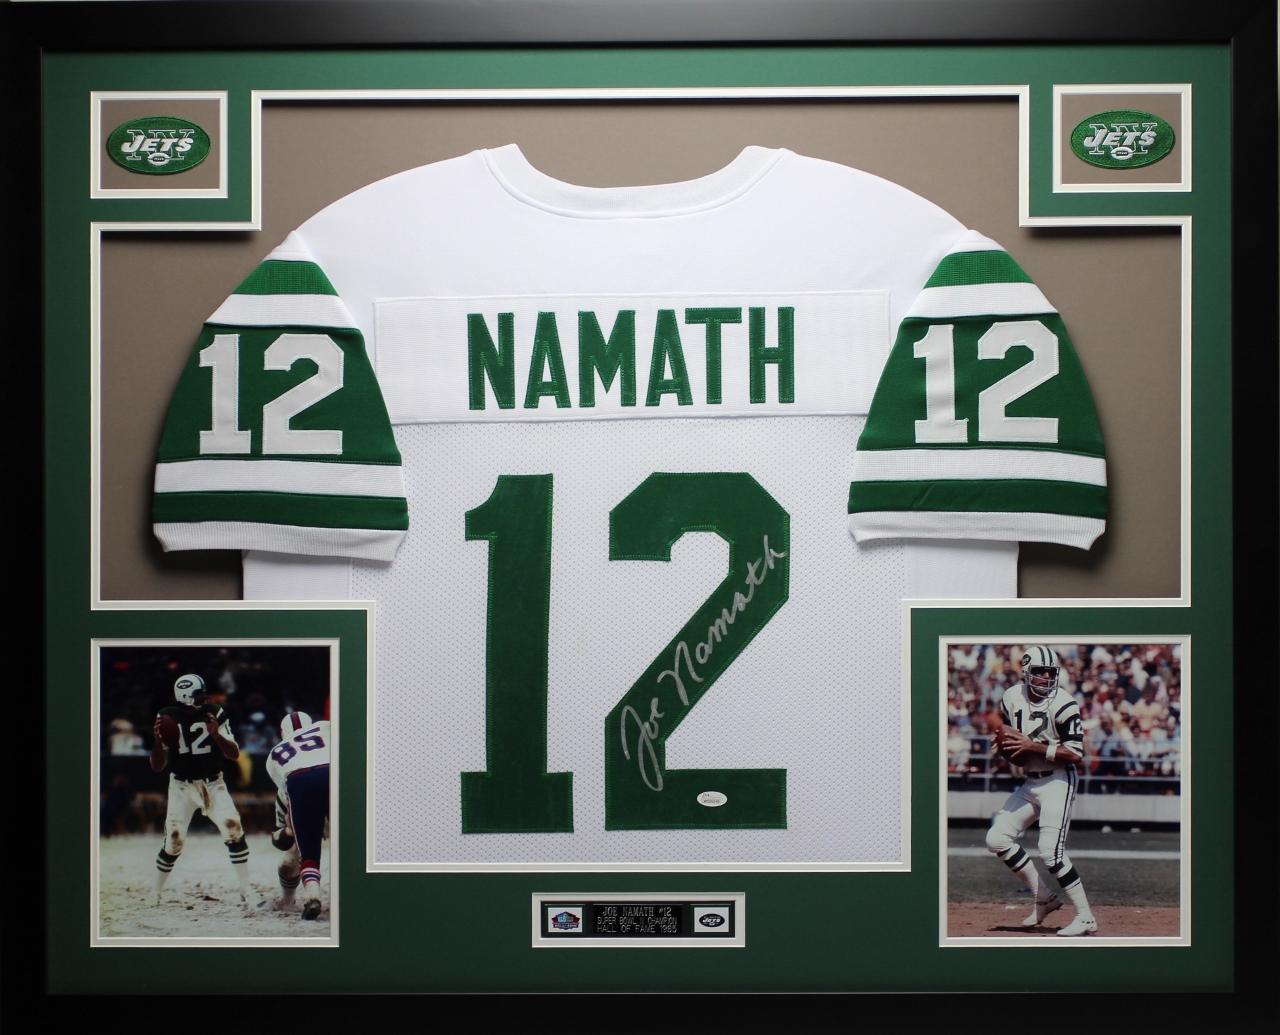 Details about Joe Namath Autographed and Framed White Jets Jersey Auto JSA  COA (D4-L) 32bae0bfa